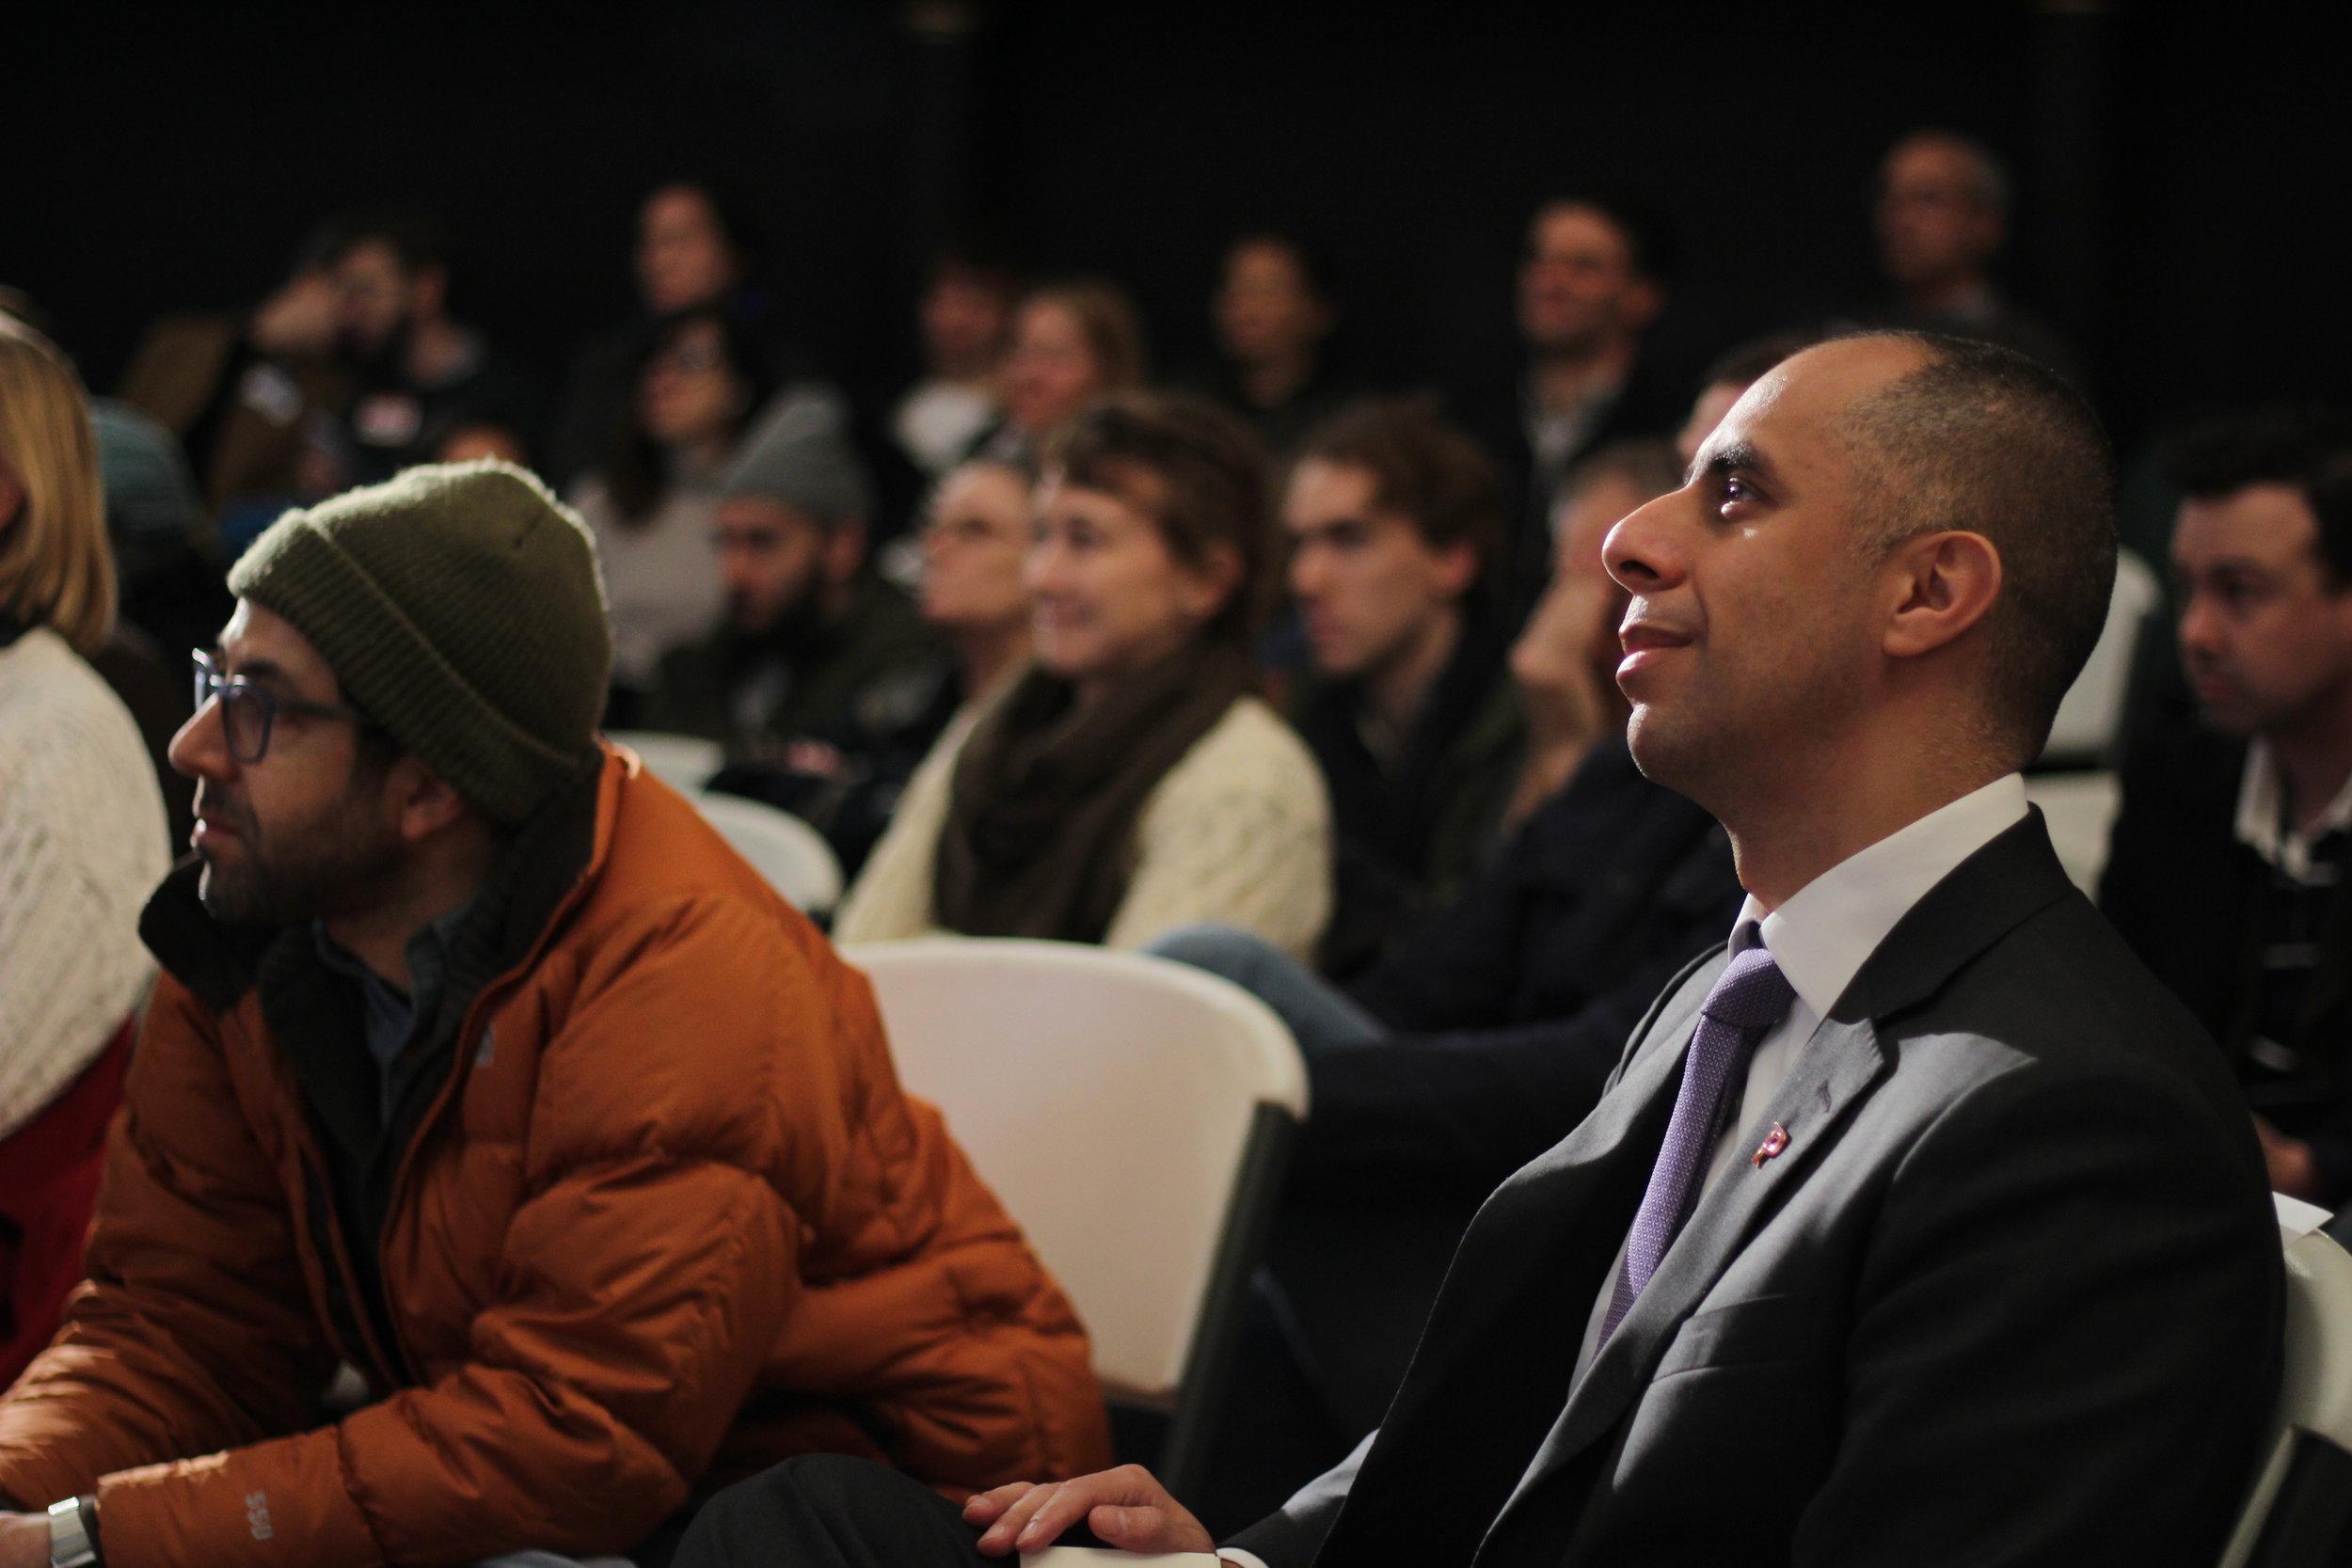 Mayor Jorge Elorza joins the meeting